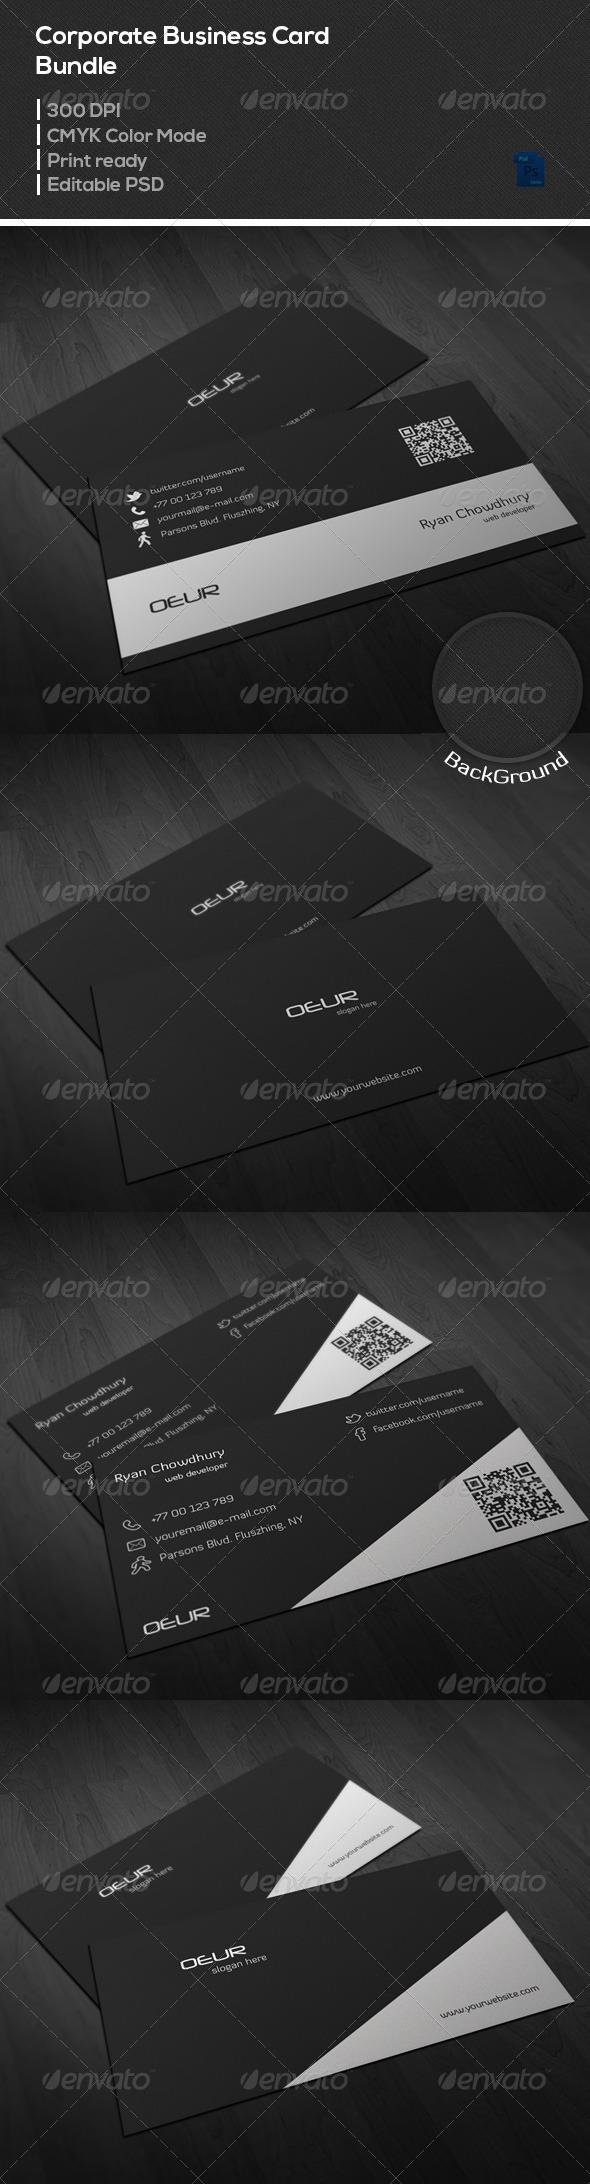 GraphicRiver Corporate Business Card Bundle 7020422